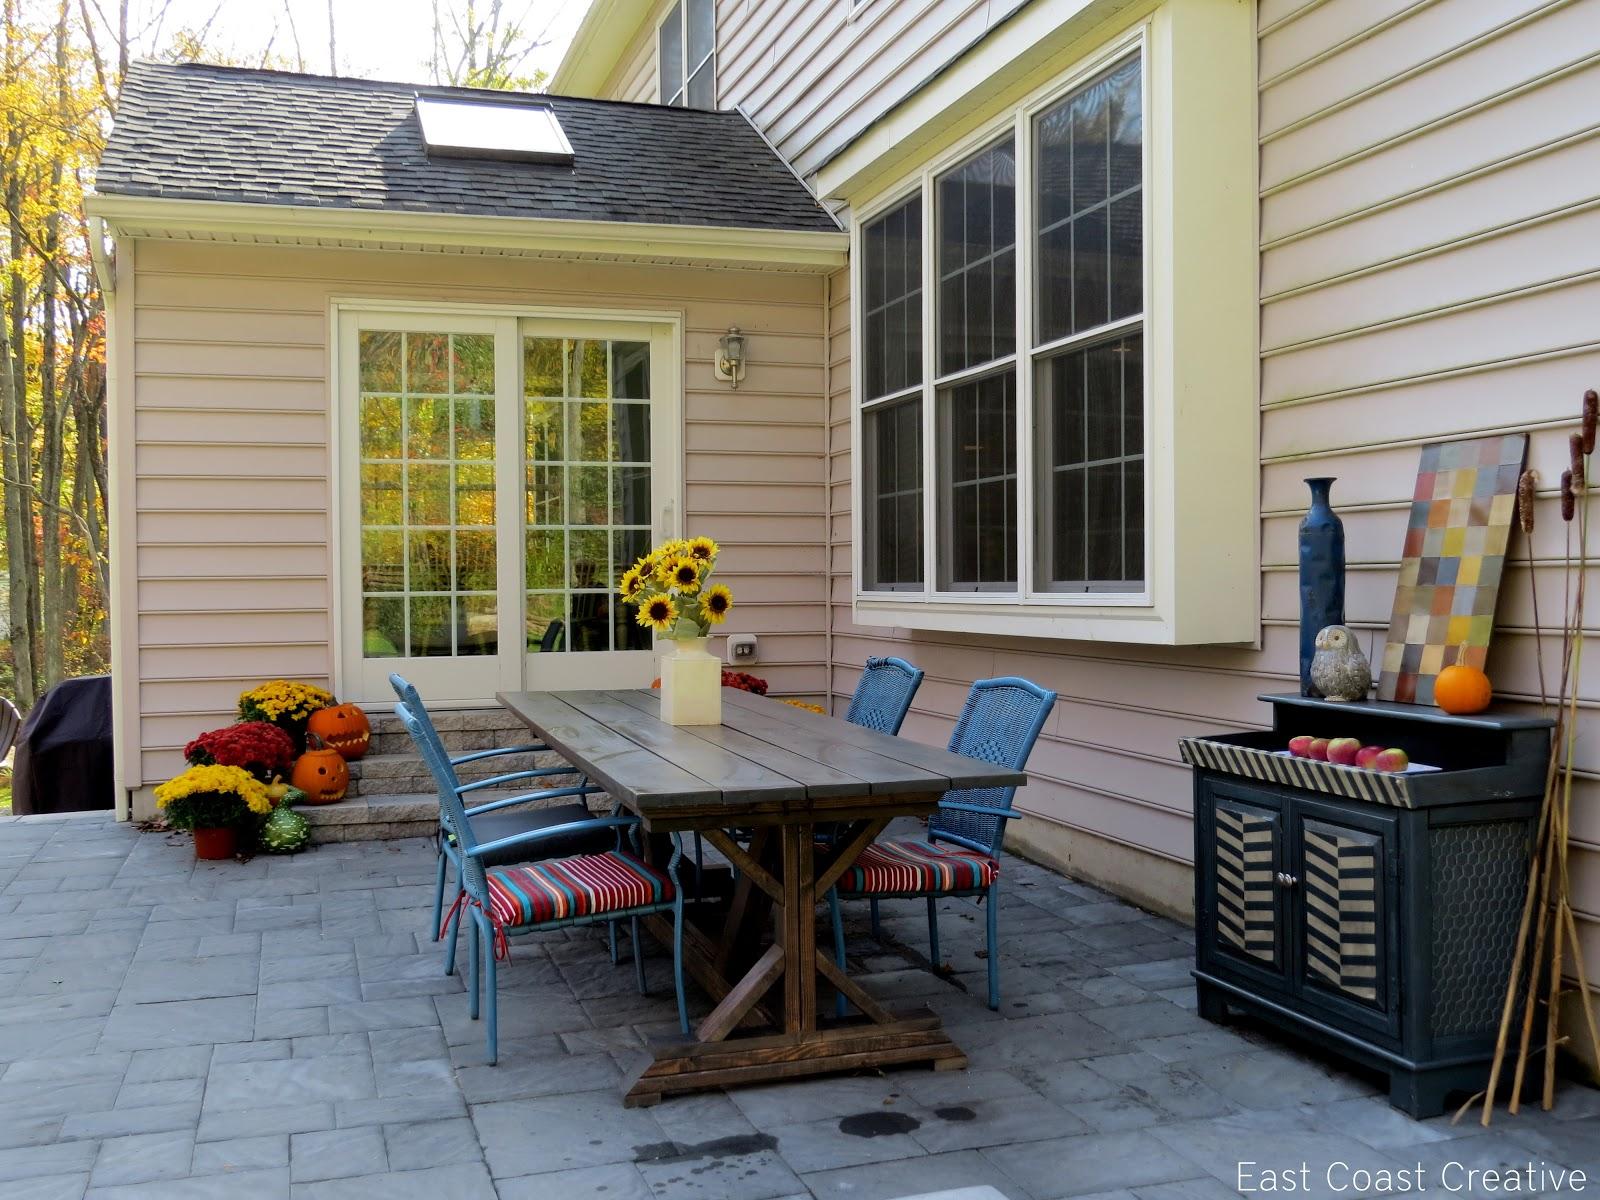 diy patio reveal it u0027s finally here east coast creative blog